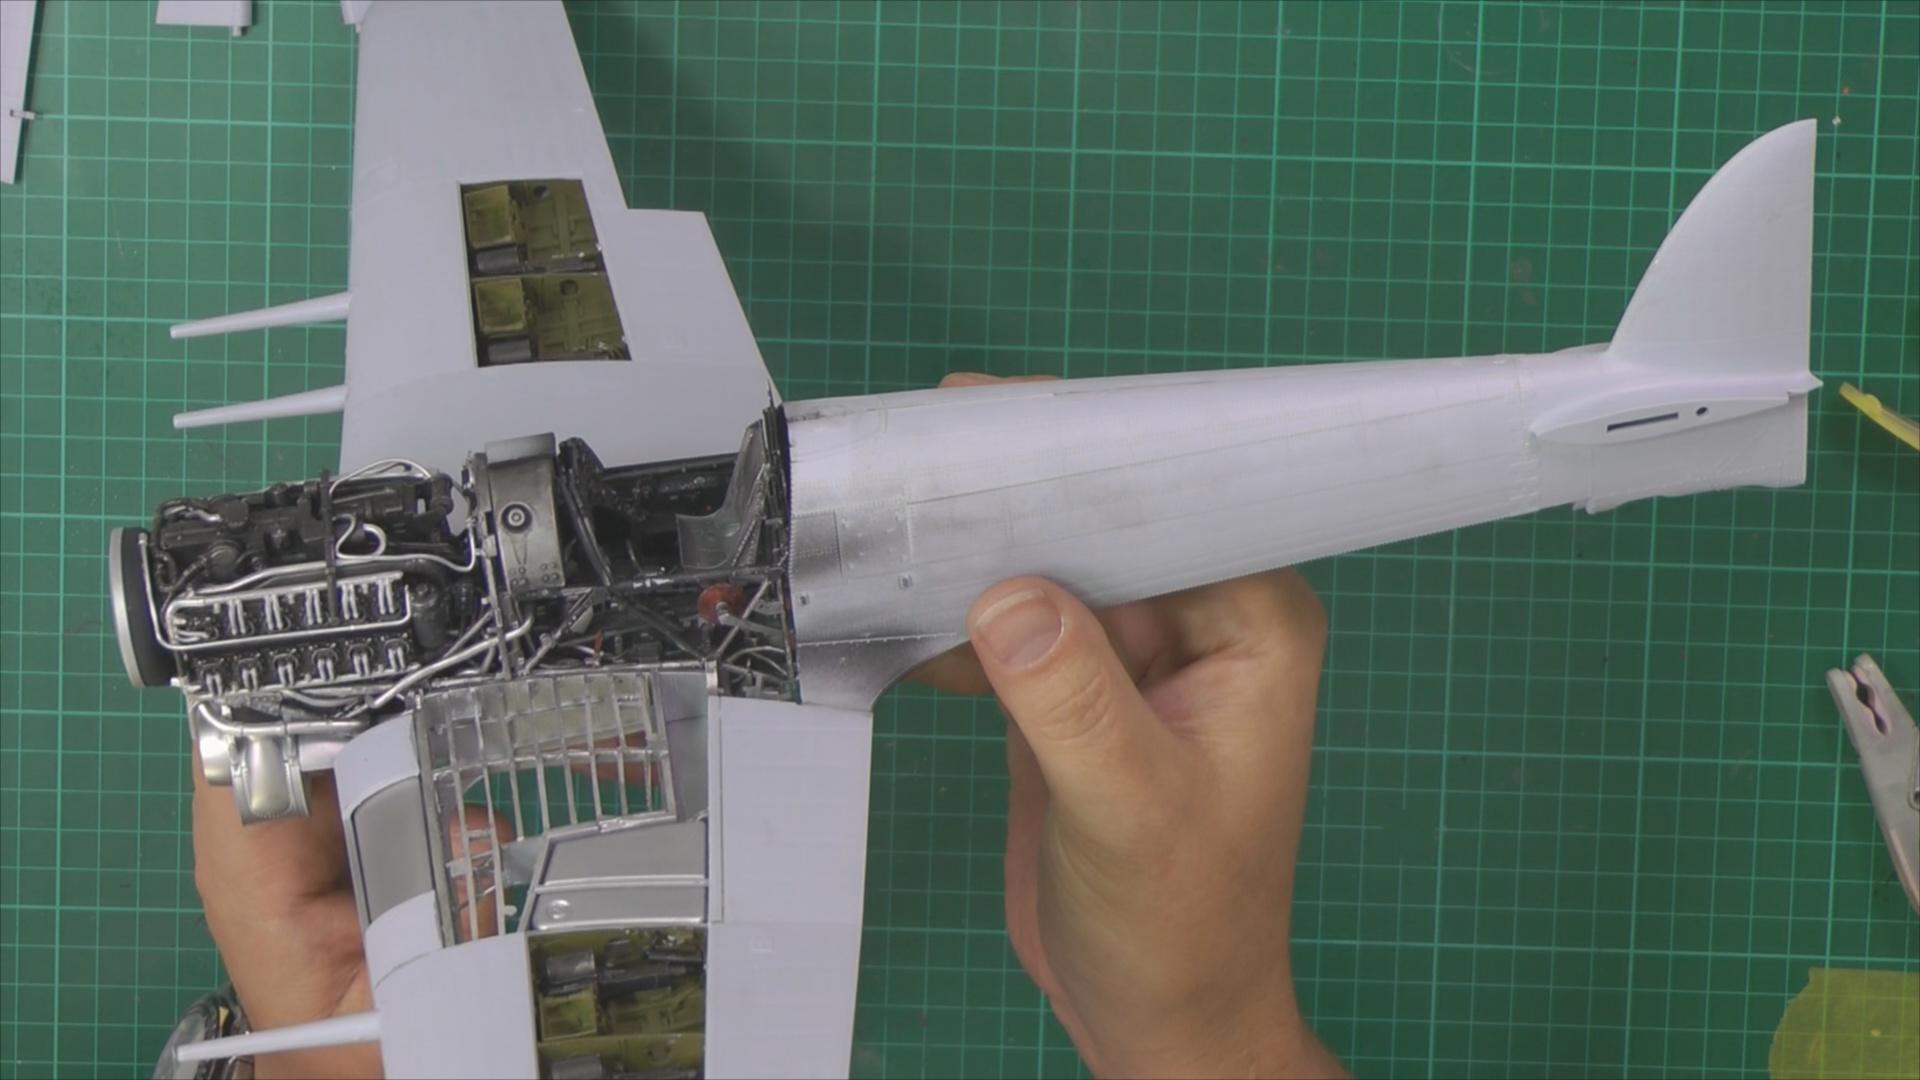 Hawker+Typhoon+Part+6+Pic+2.jpg